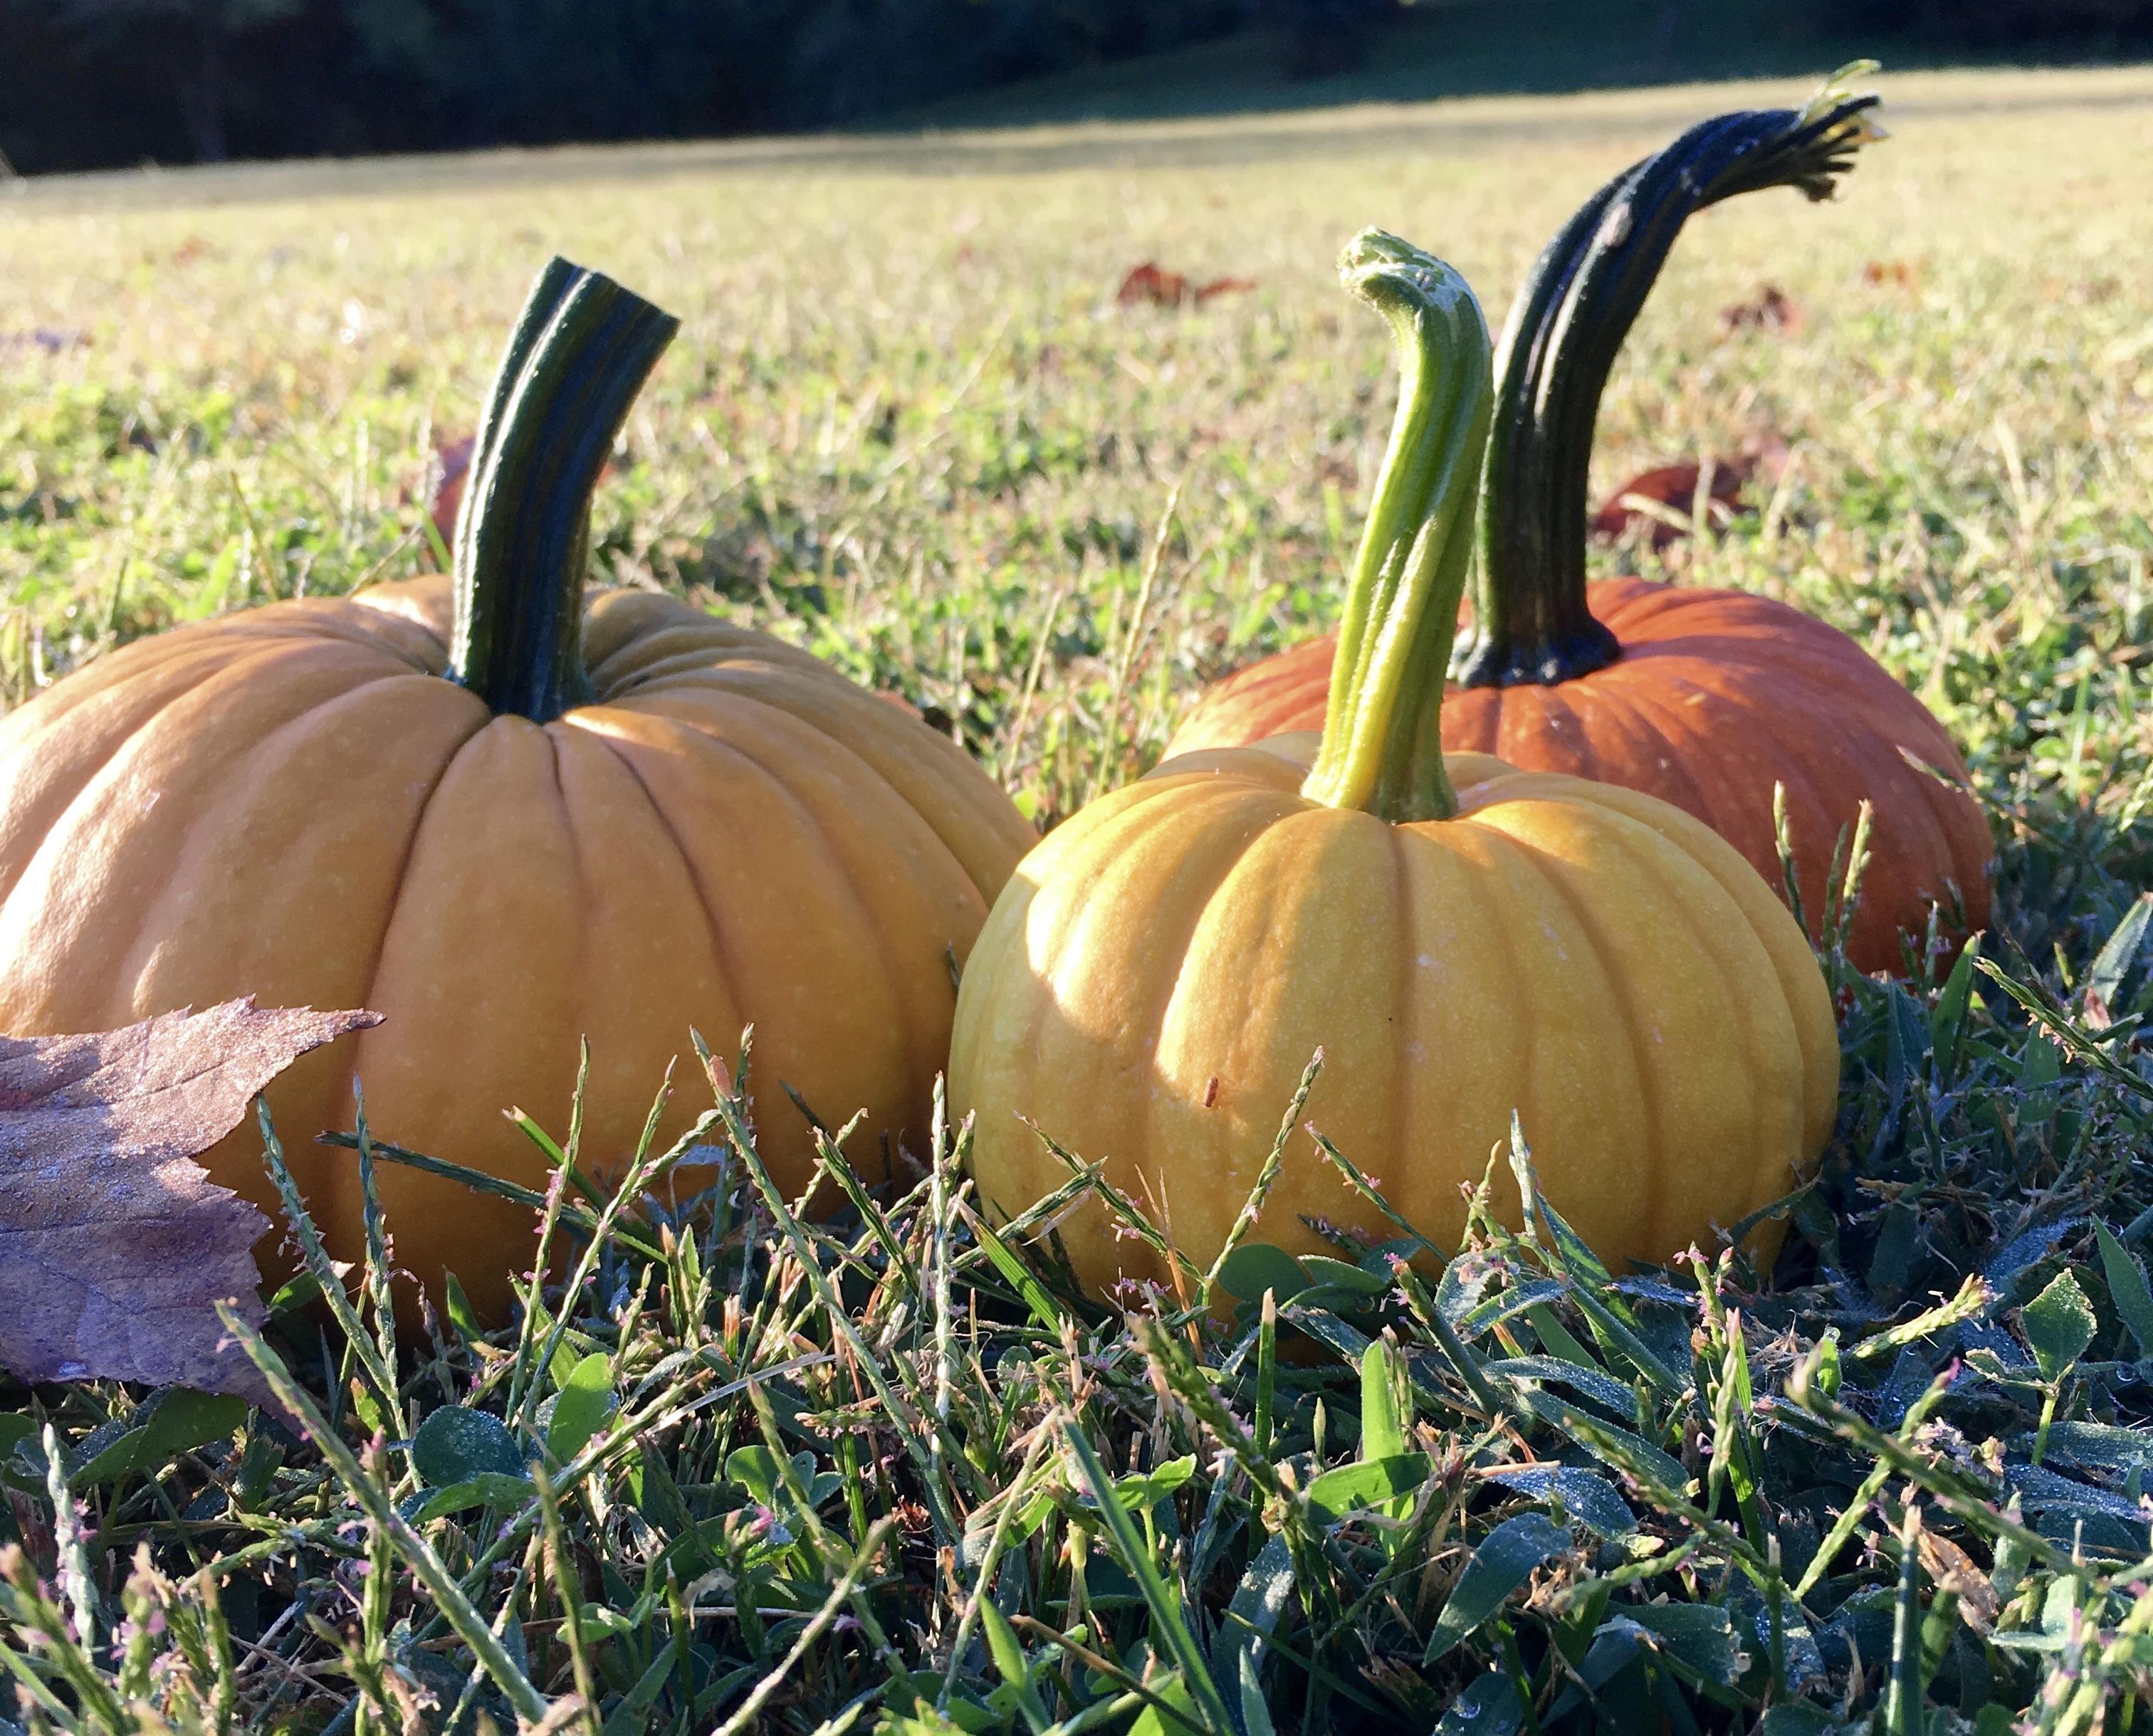 pumpkins in the yard